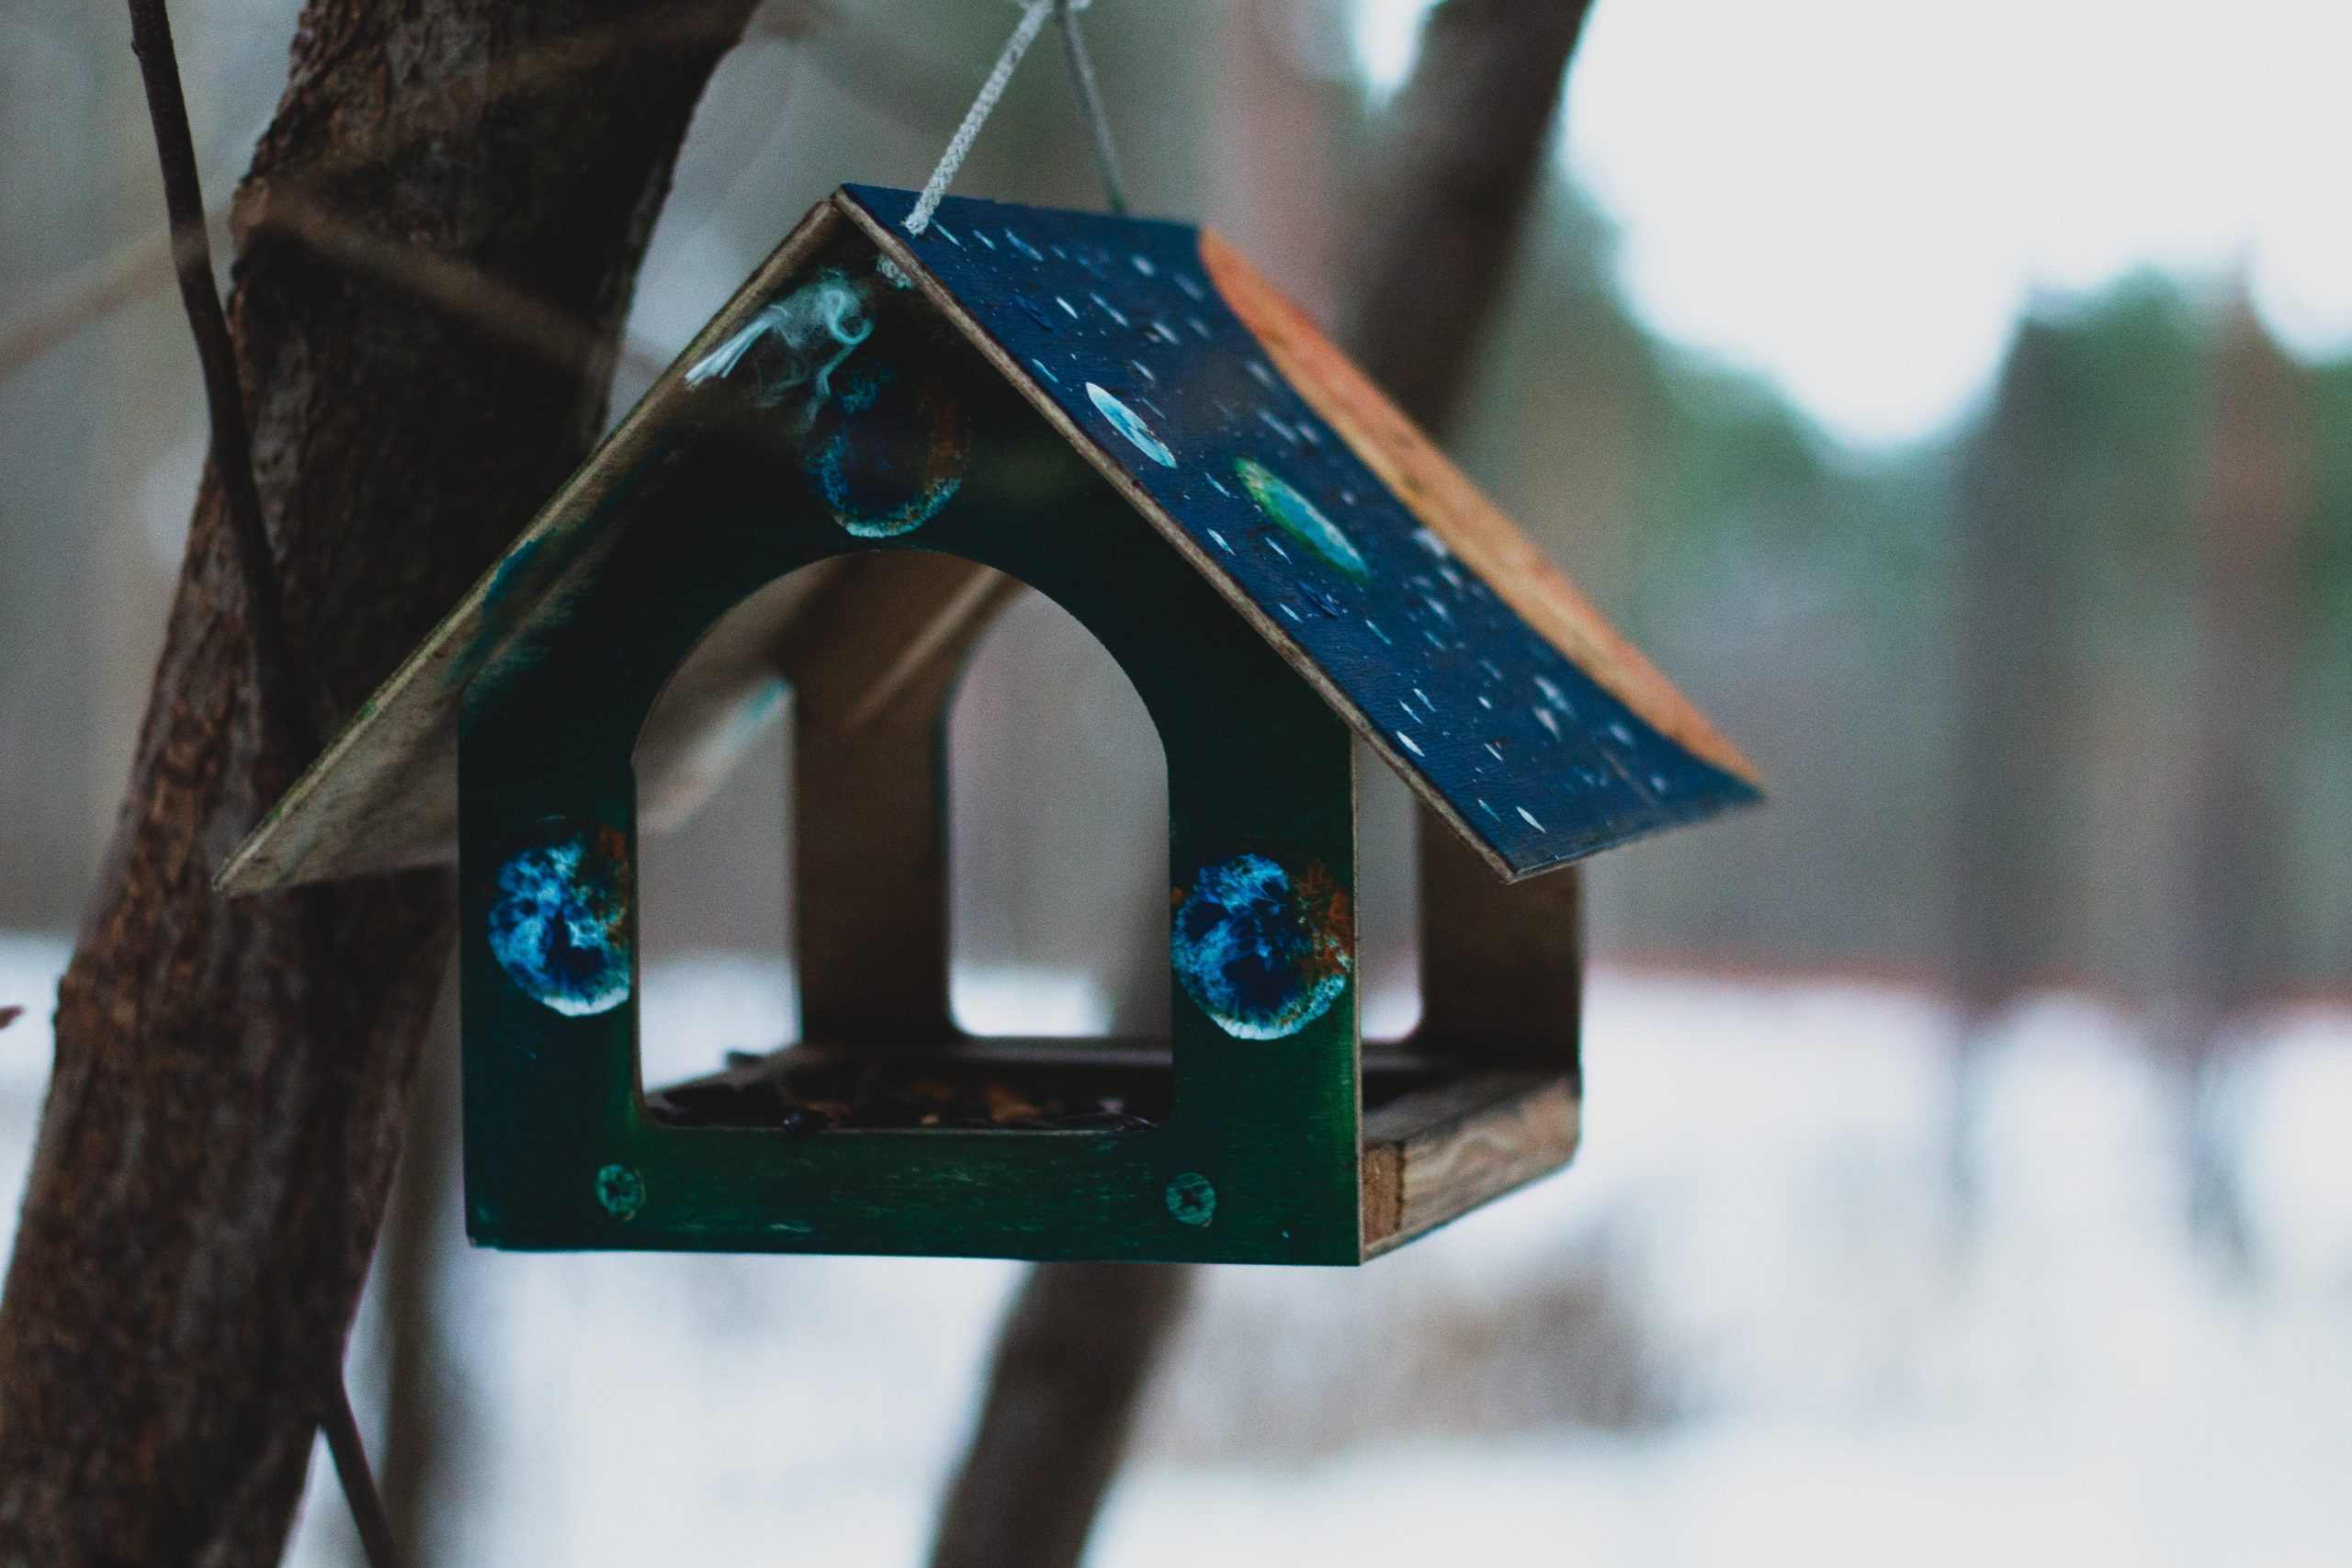 A bird feeder hangs from a tree.